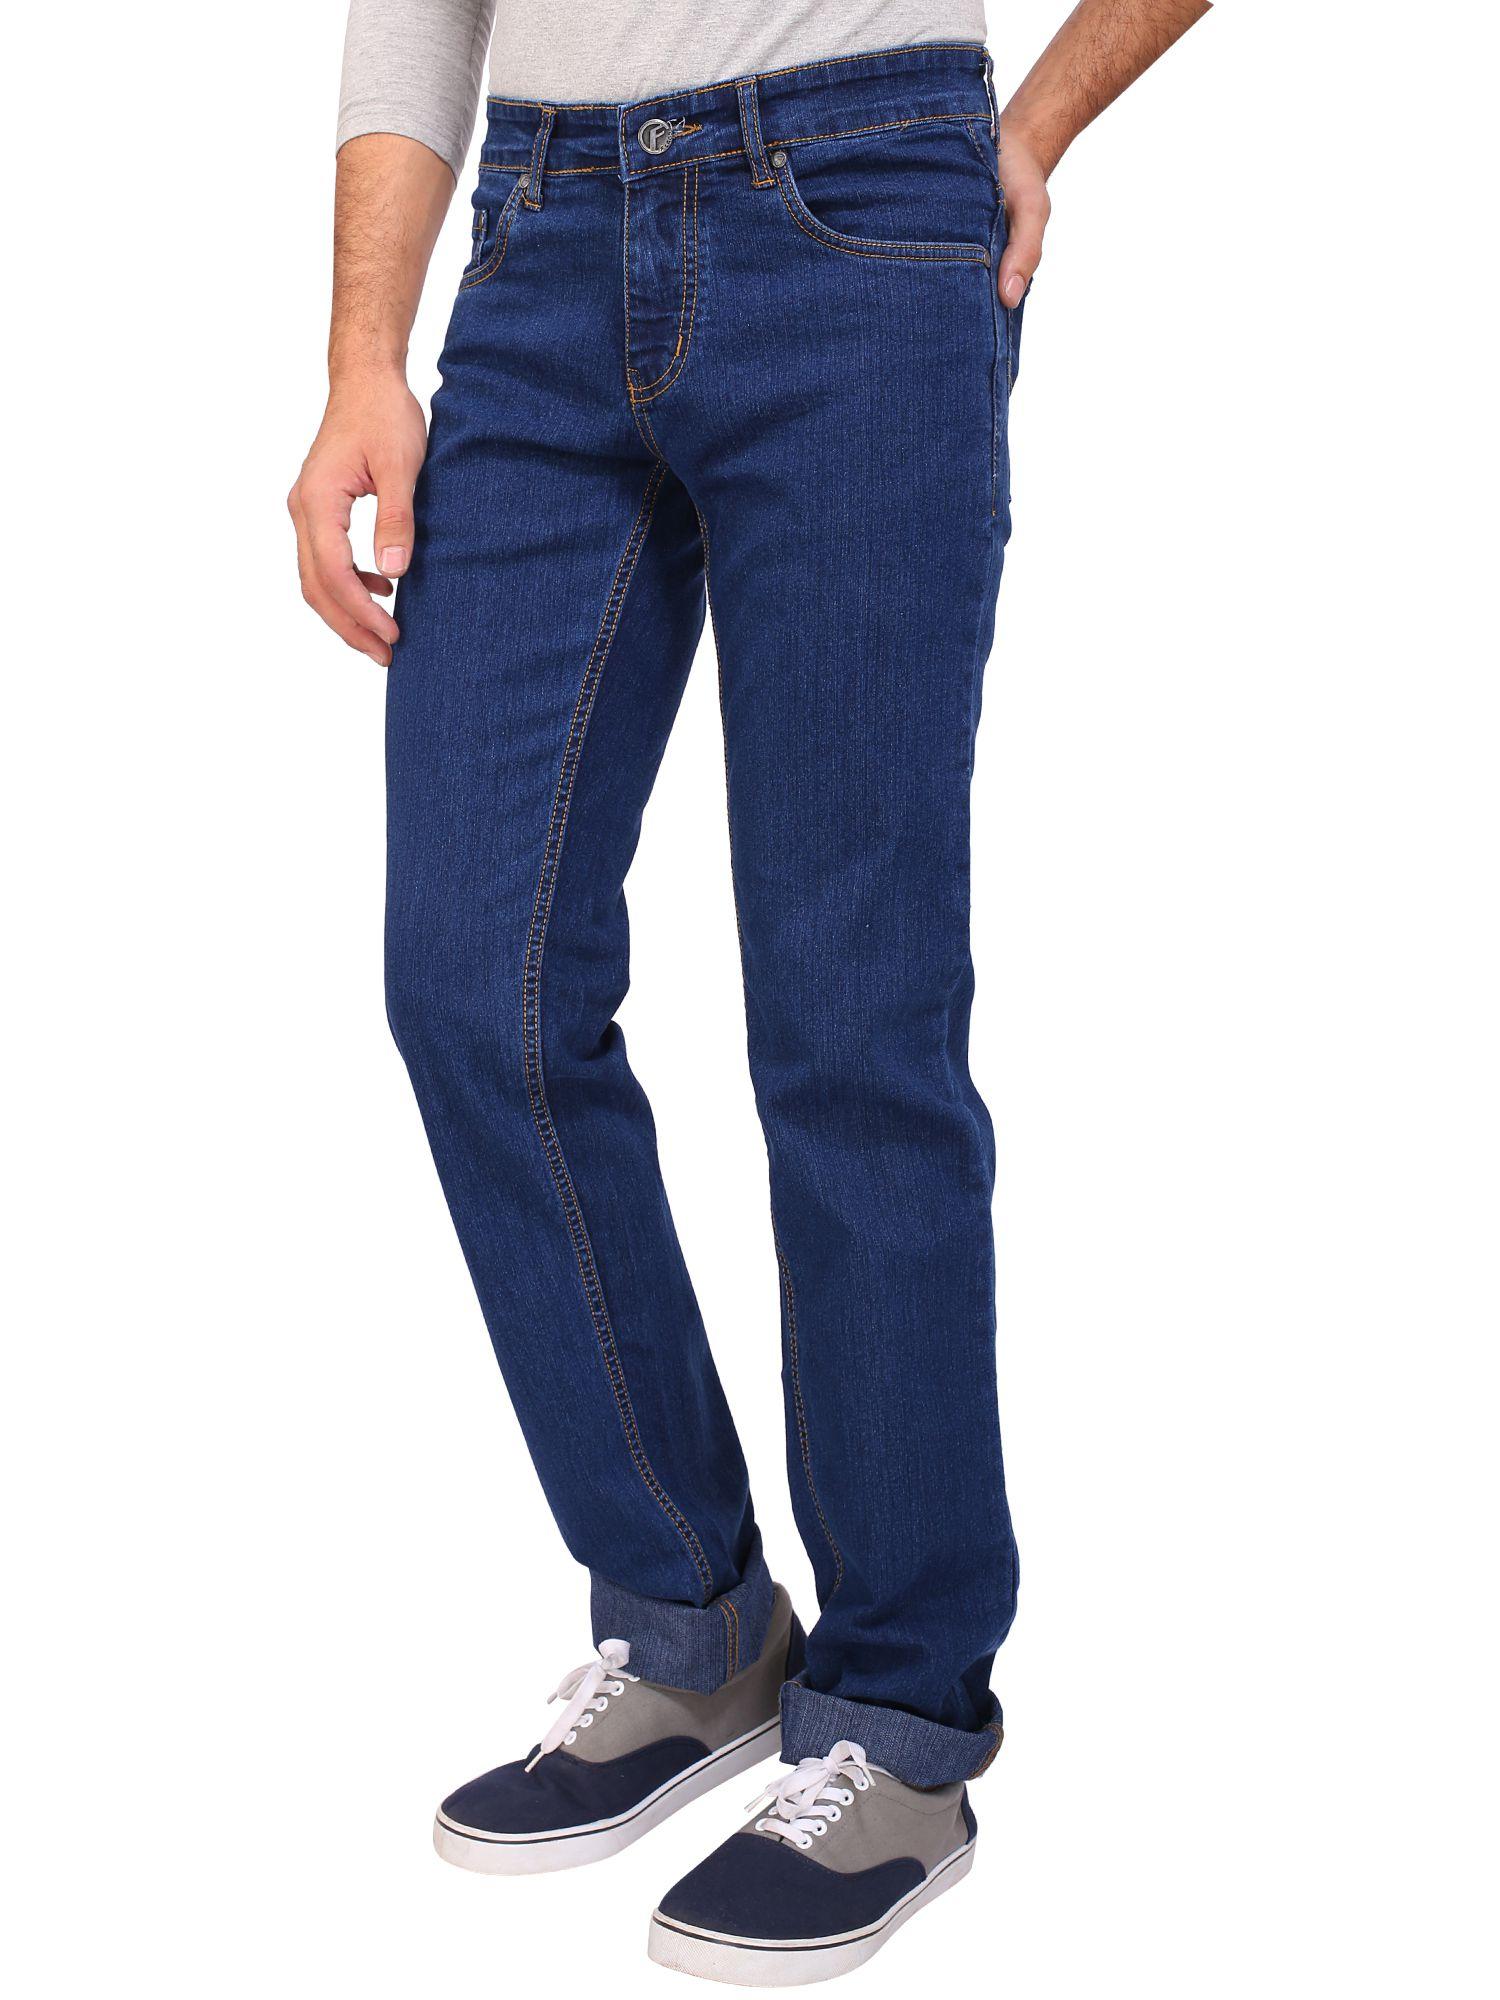 Flags Blue Regular Fit Jeans